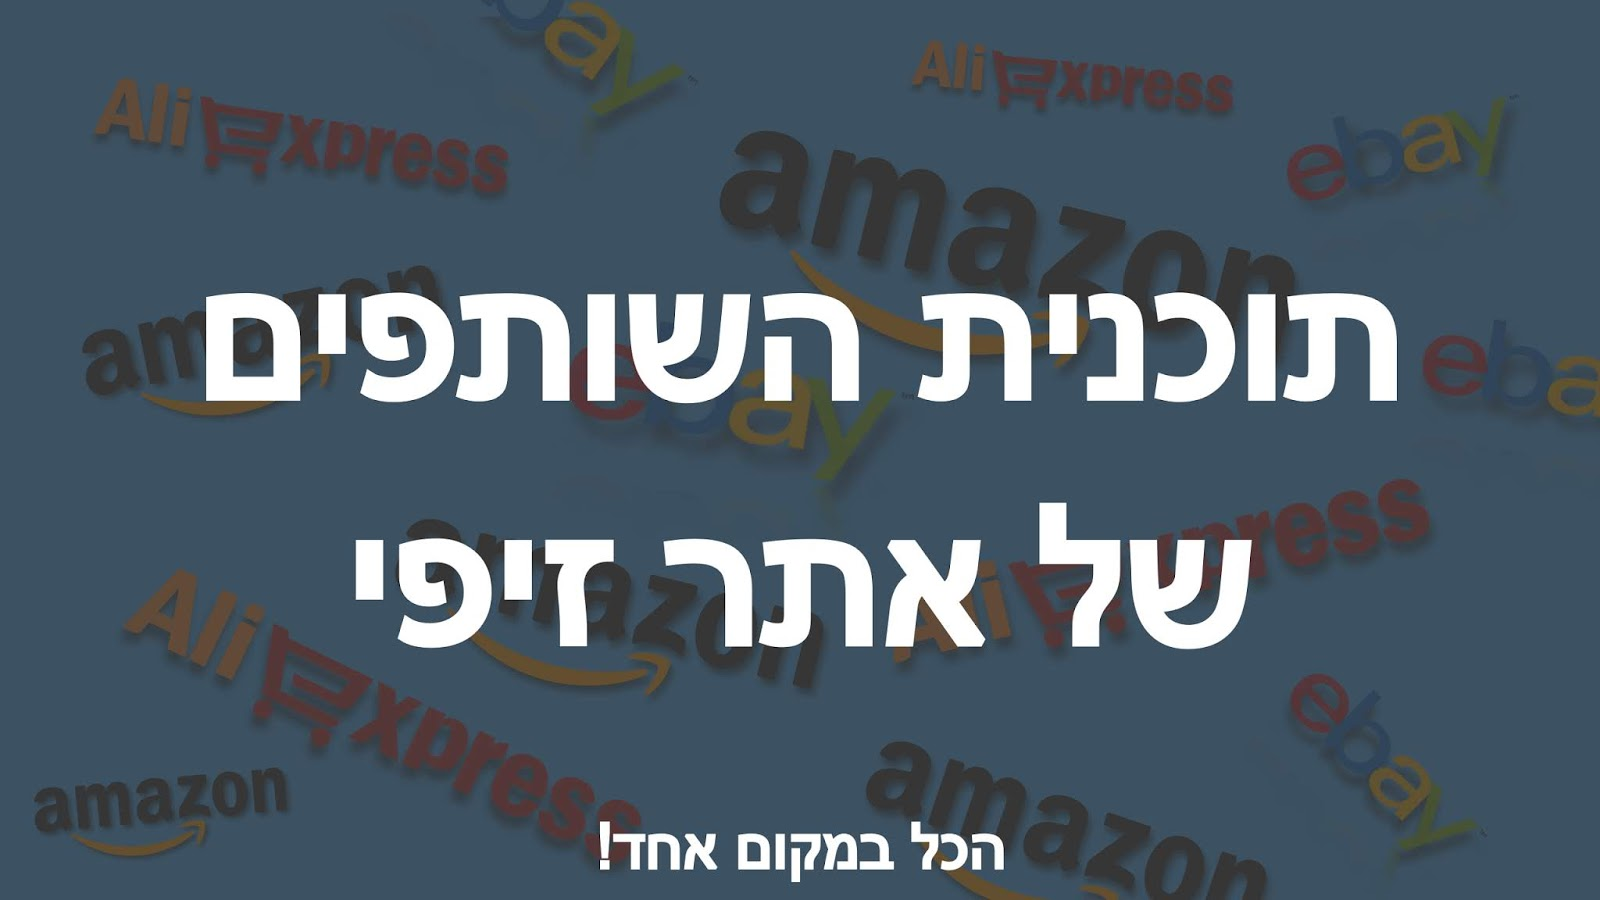 זיפי - איביי אמזון ואלי אקספרס בעברית